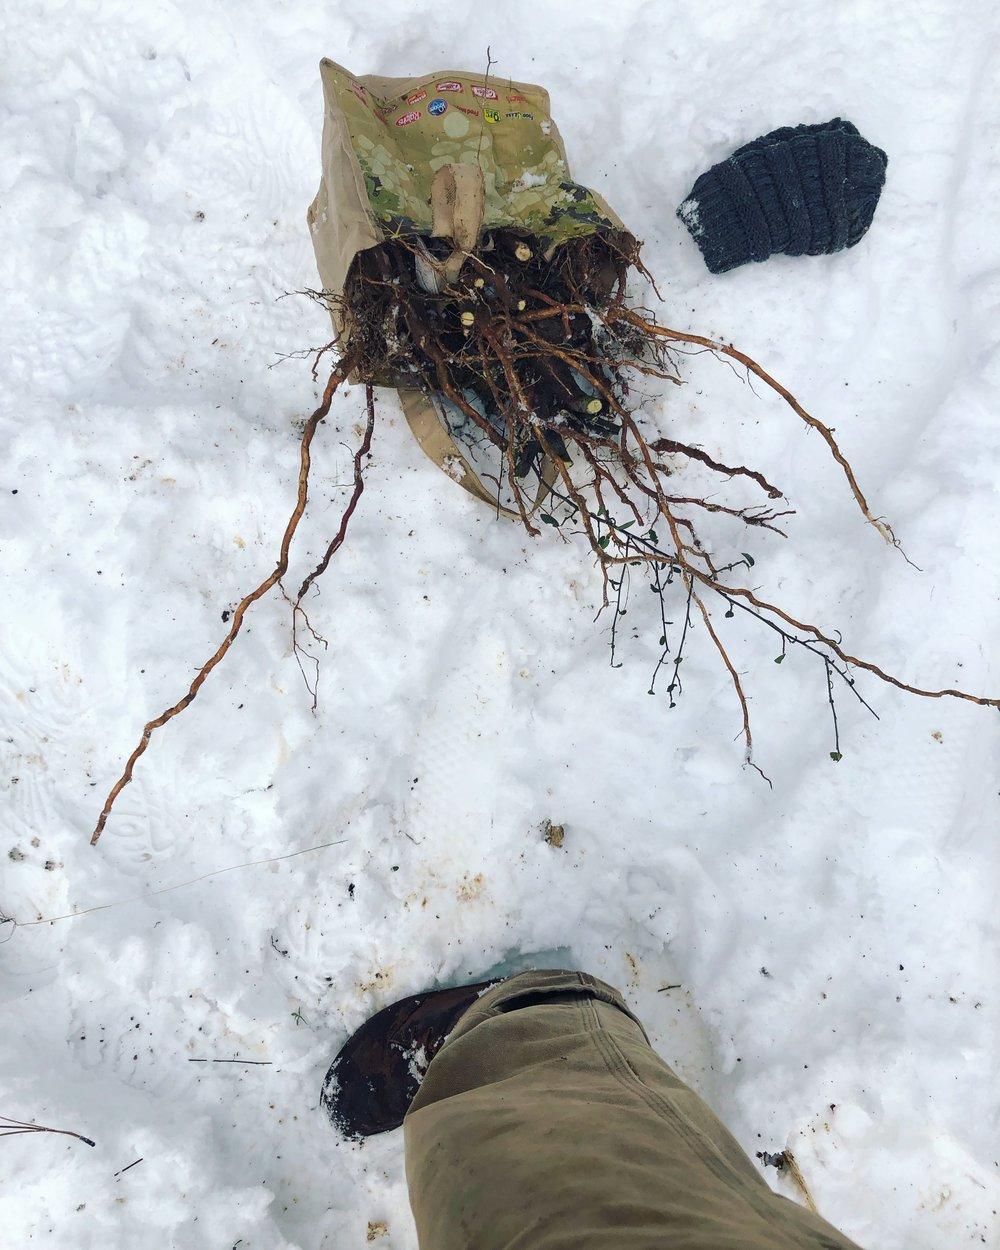 Ceanothus spp . harvest. Trinity county, California, Winter 2019.